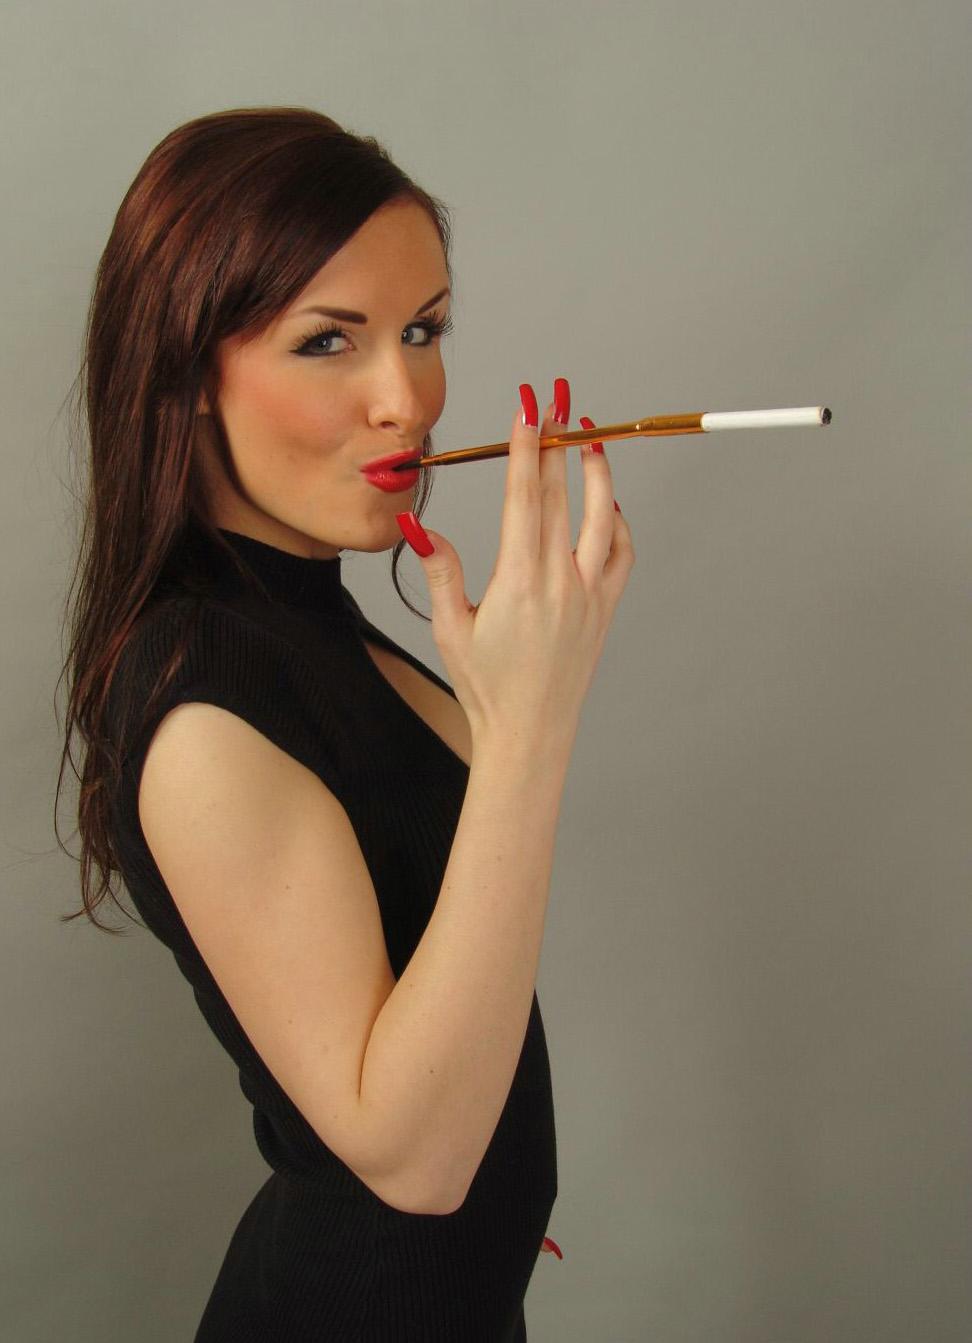 Femdom smoking humiliation photos